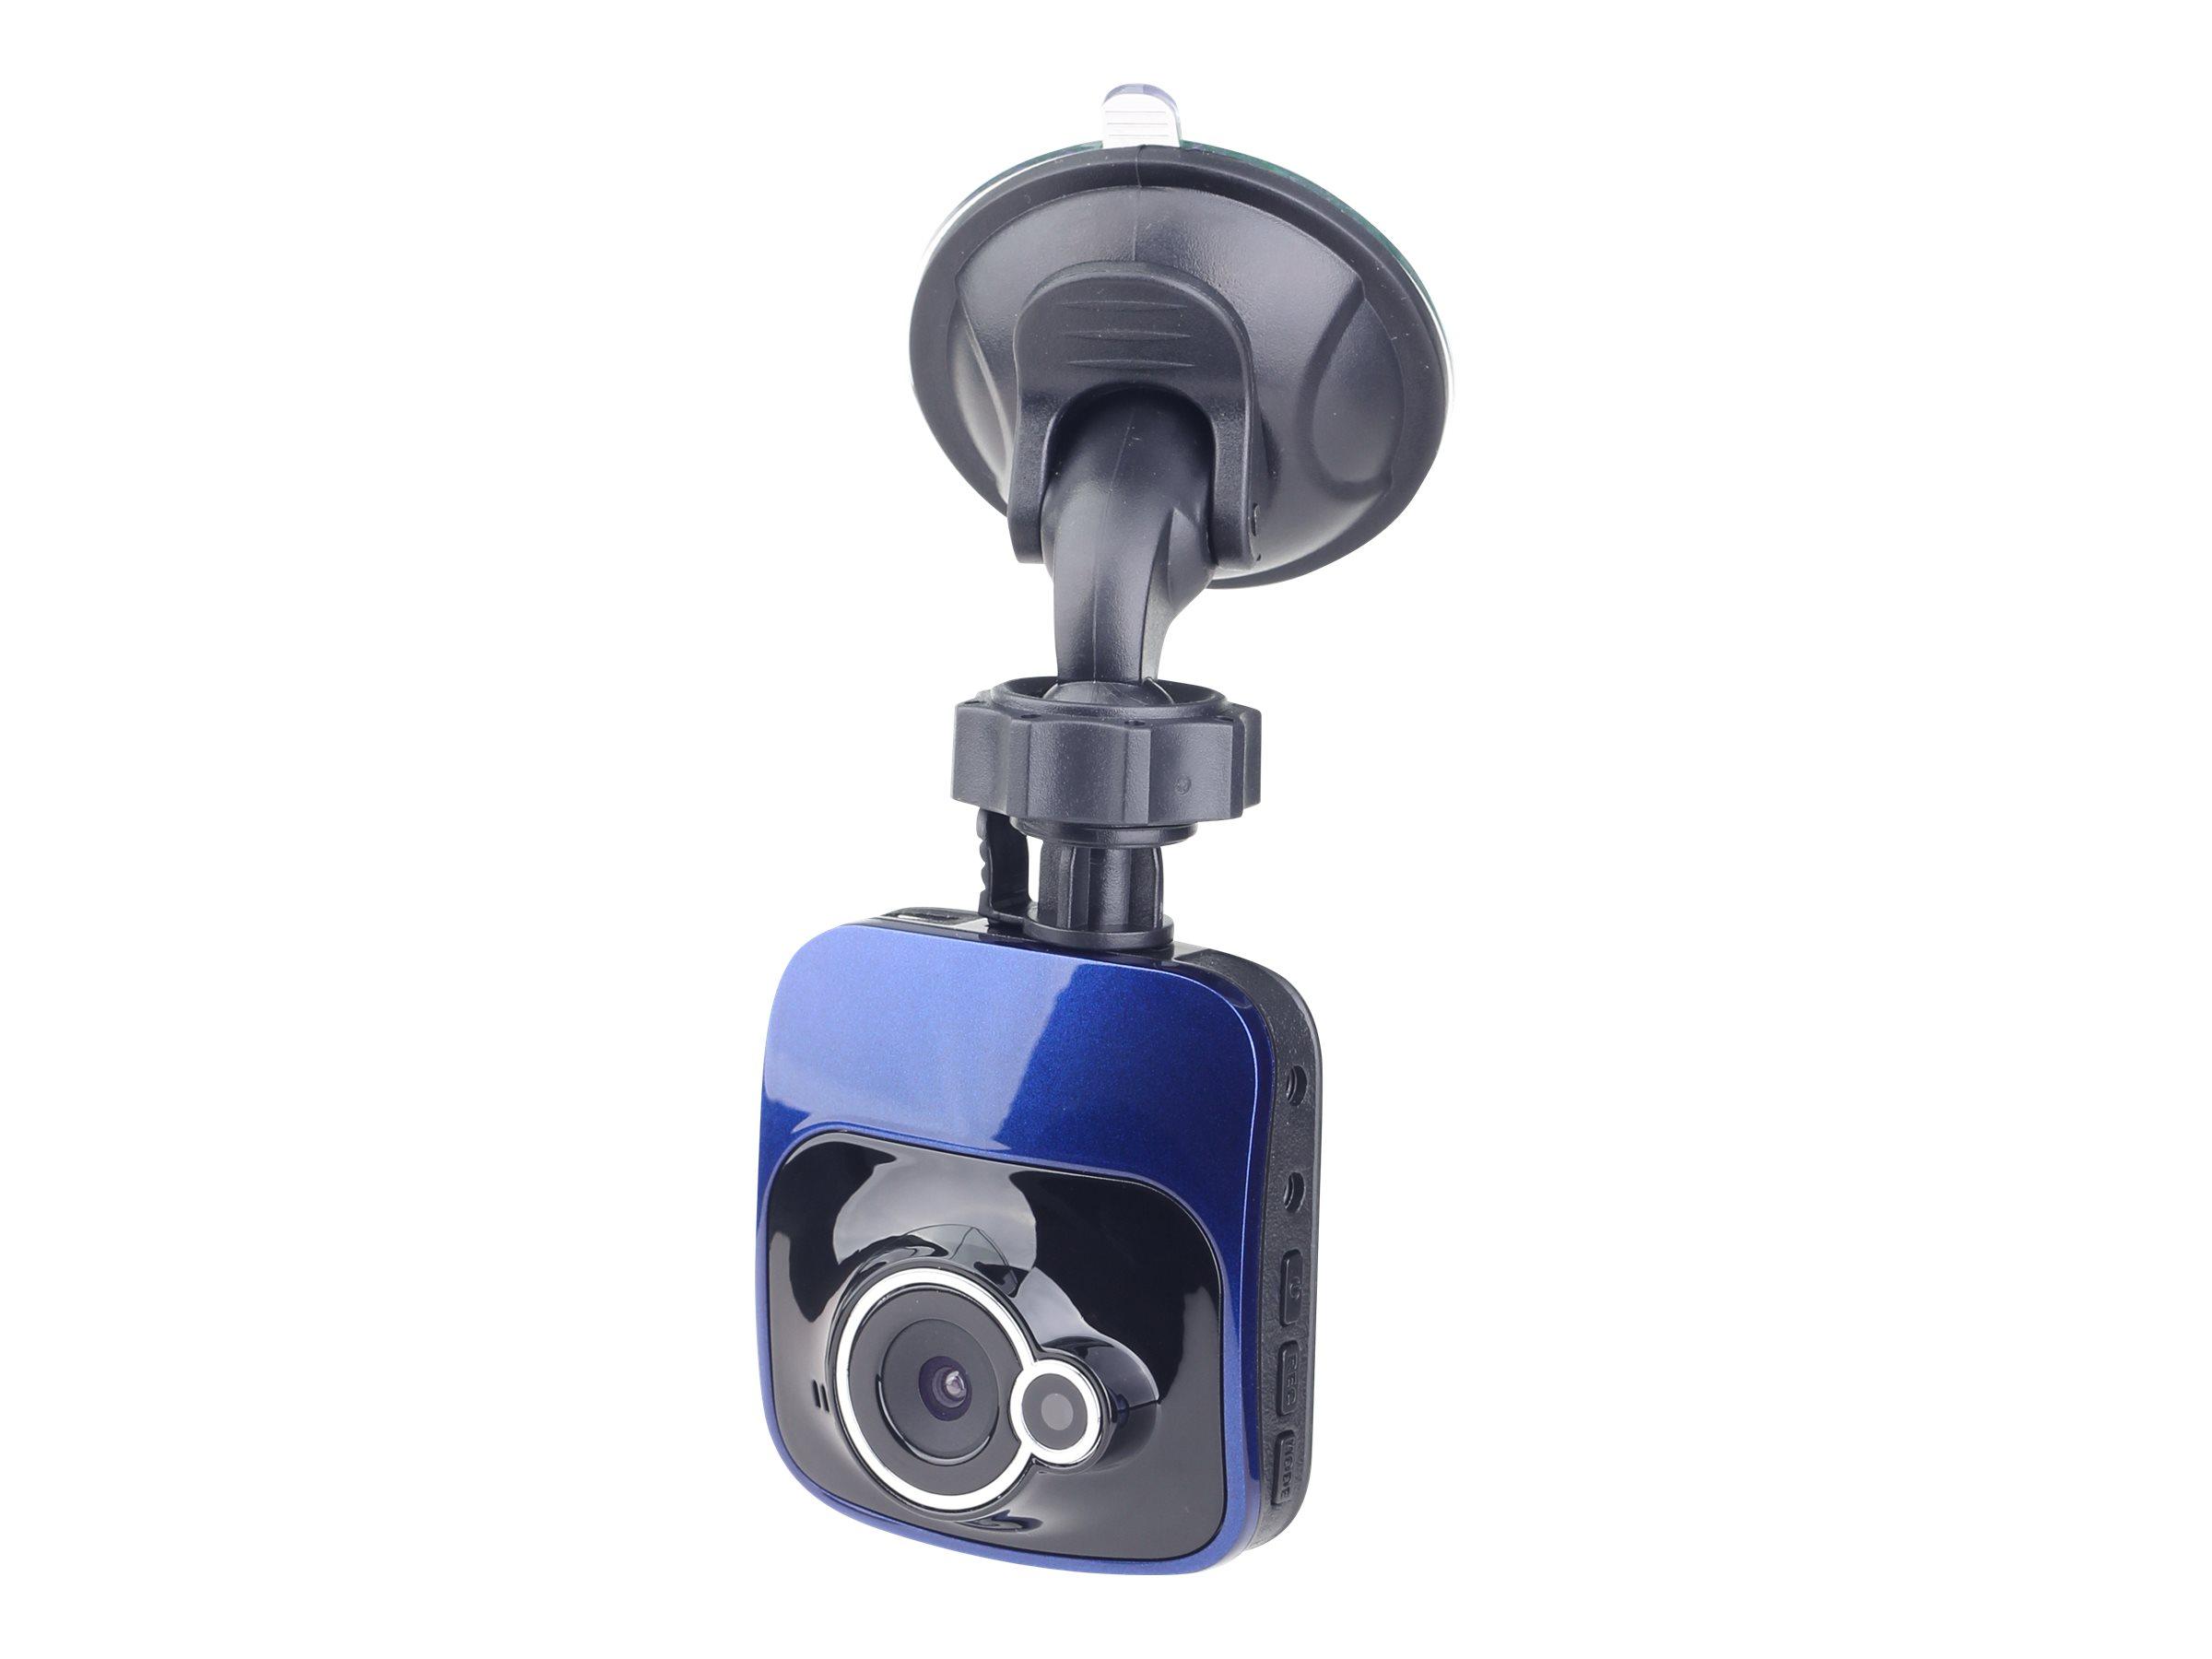 Gembird DCAM-007 - Kamera für Armaturenbrett